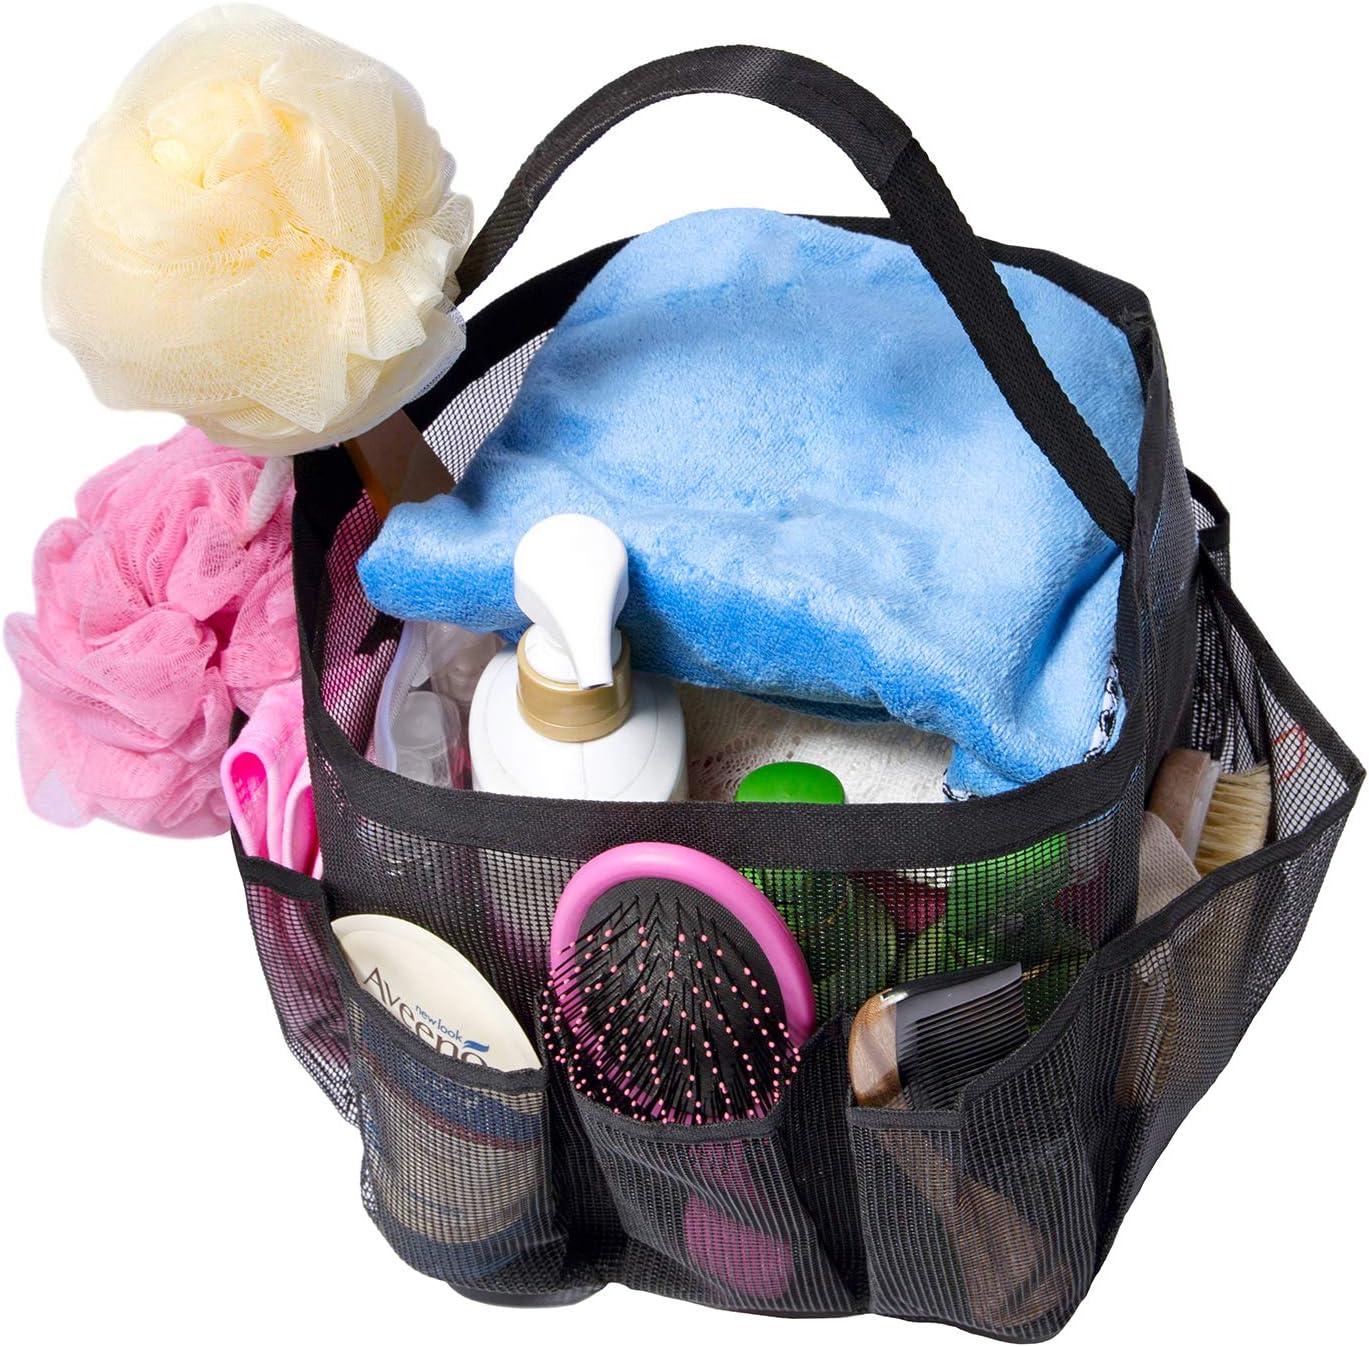 ATTMU Mesh Shower Caddy for College